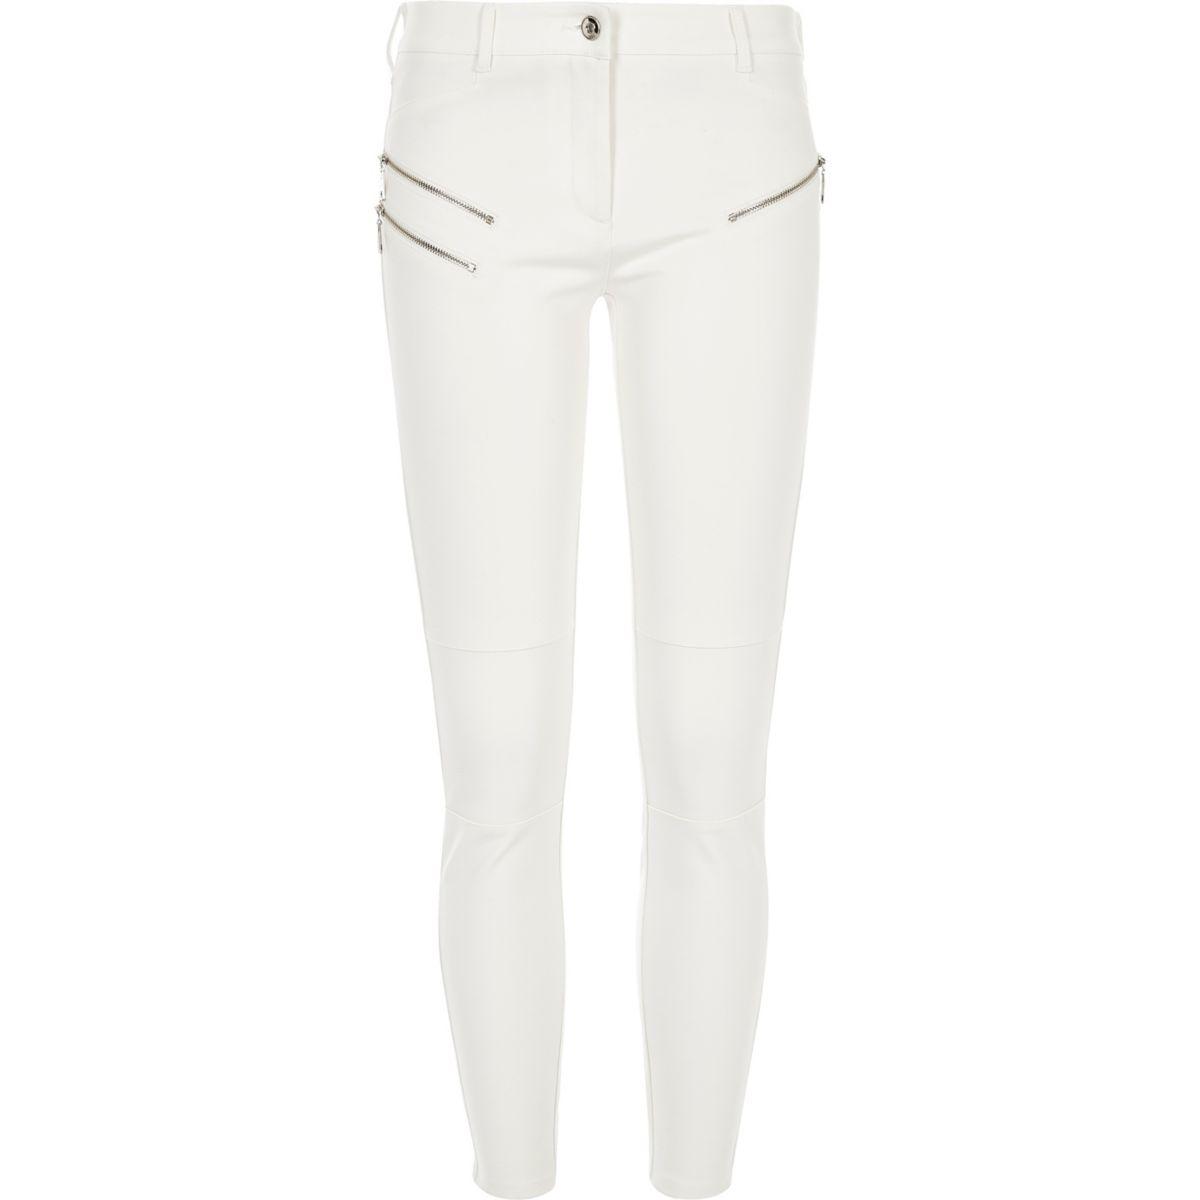 Cream ponte zip detail skinny trousers